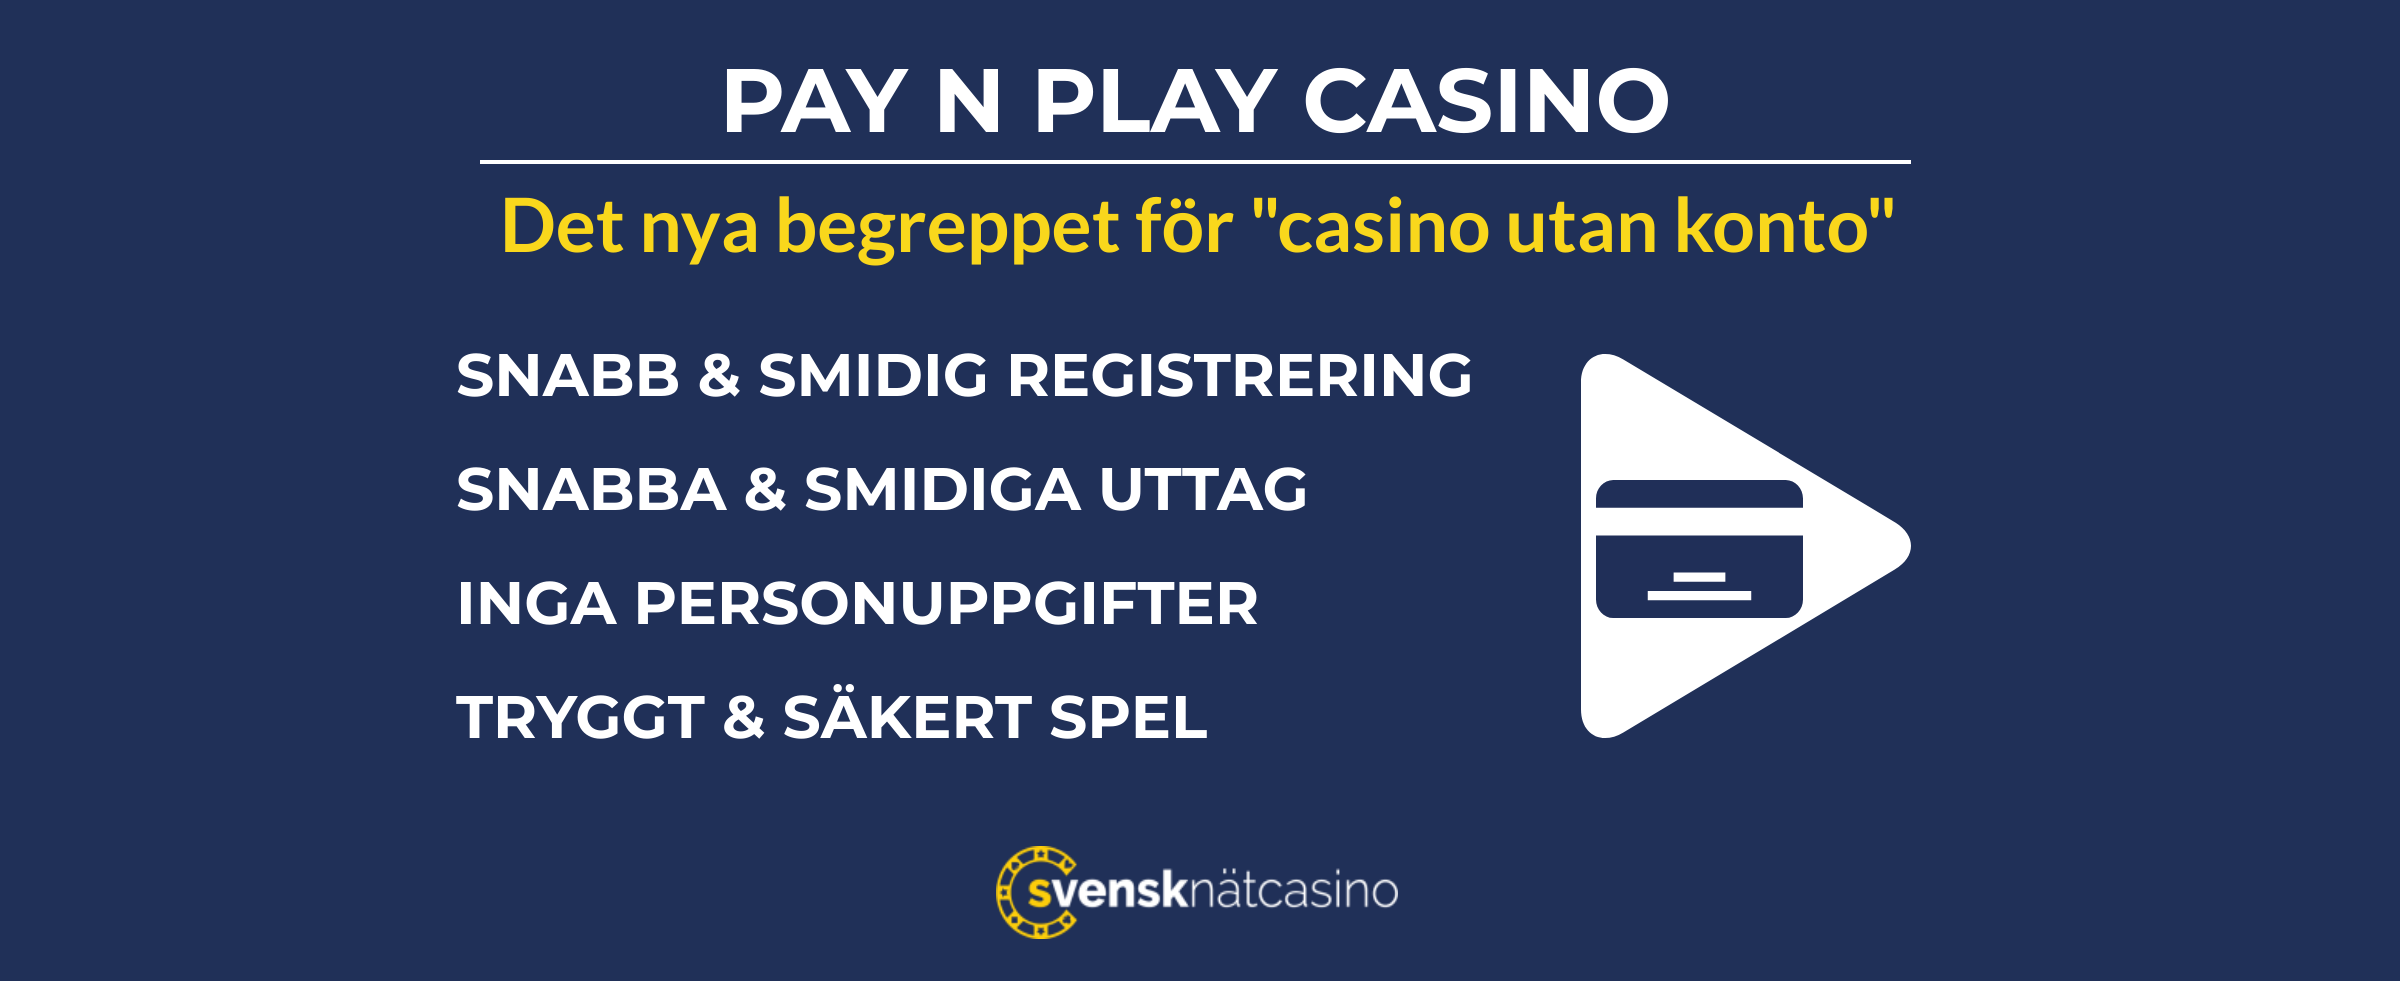 pay n play casinon utan konto svensknatcasino se